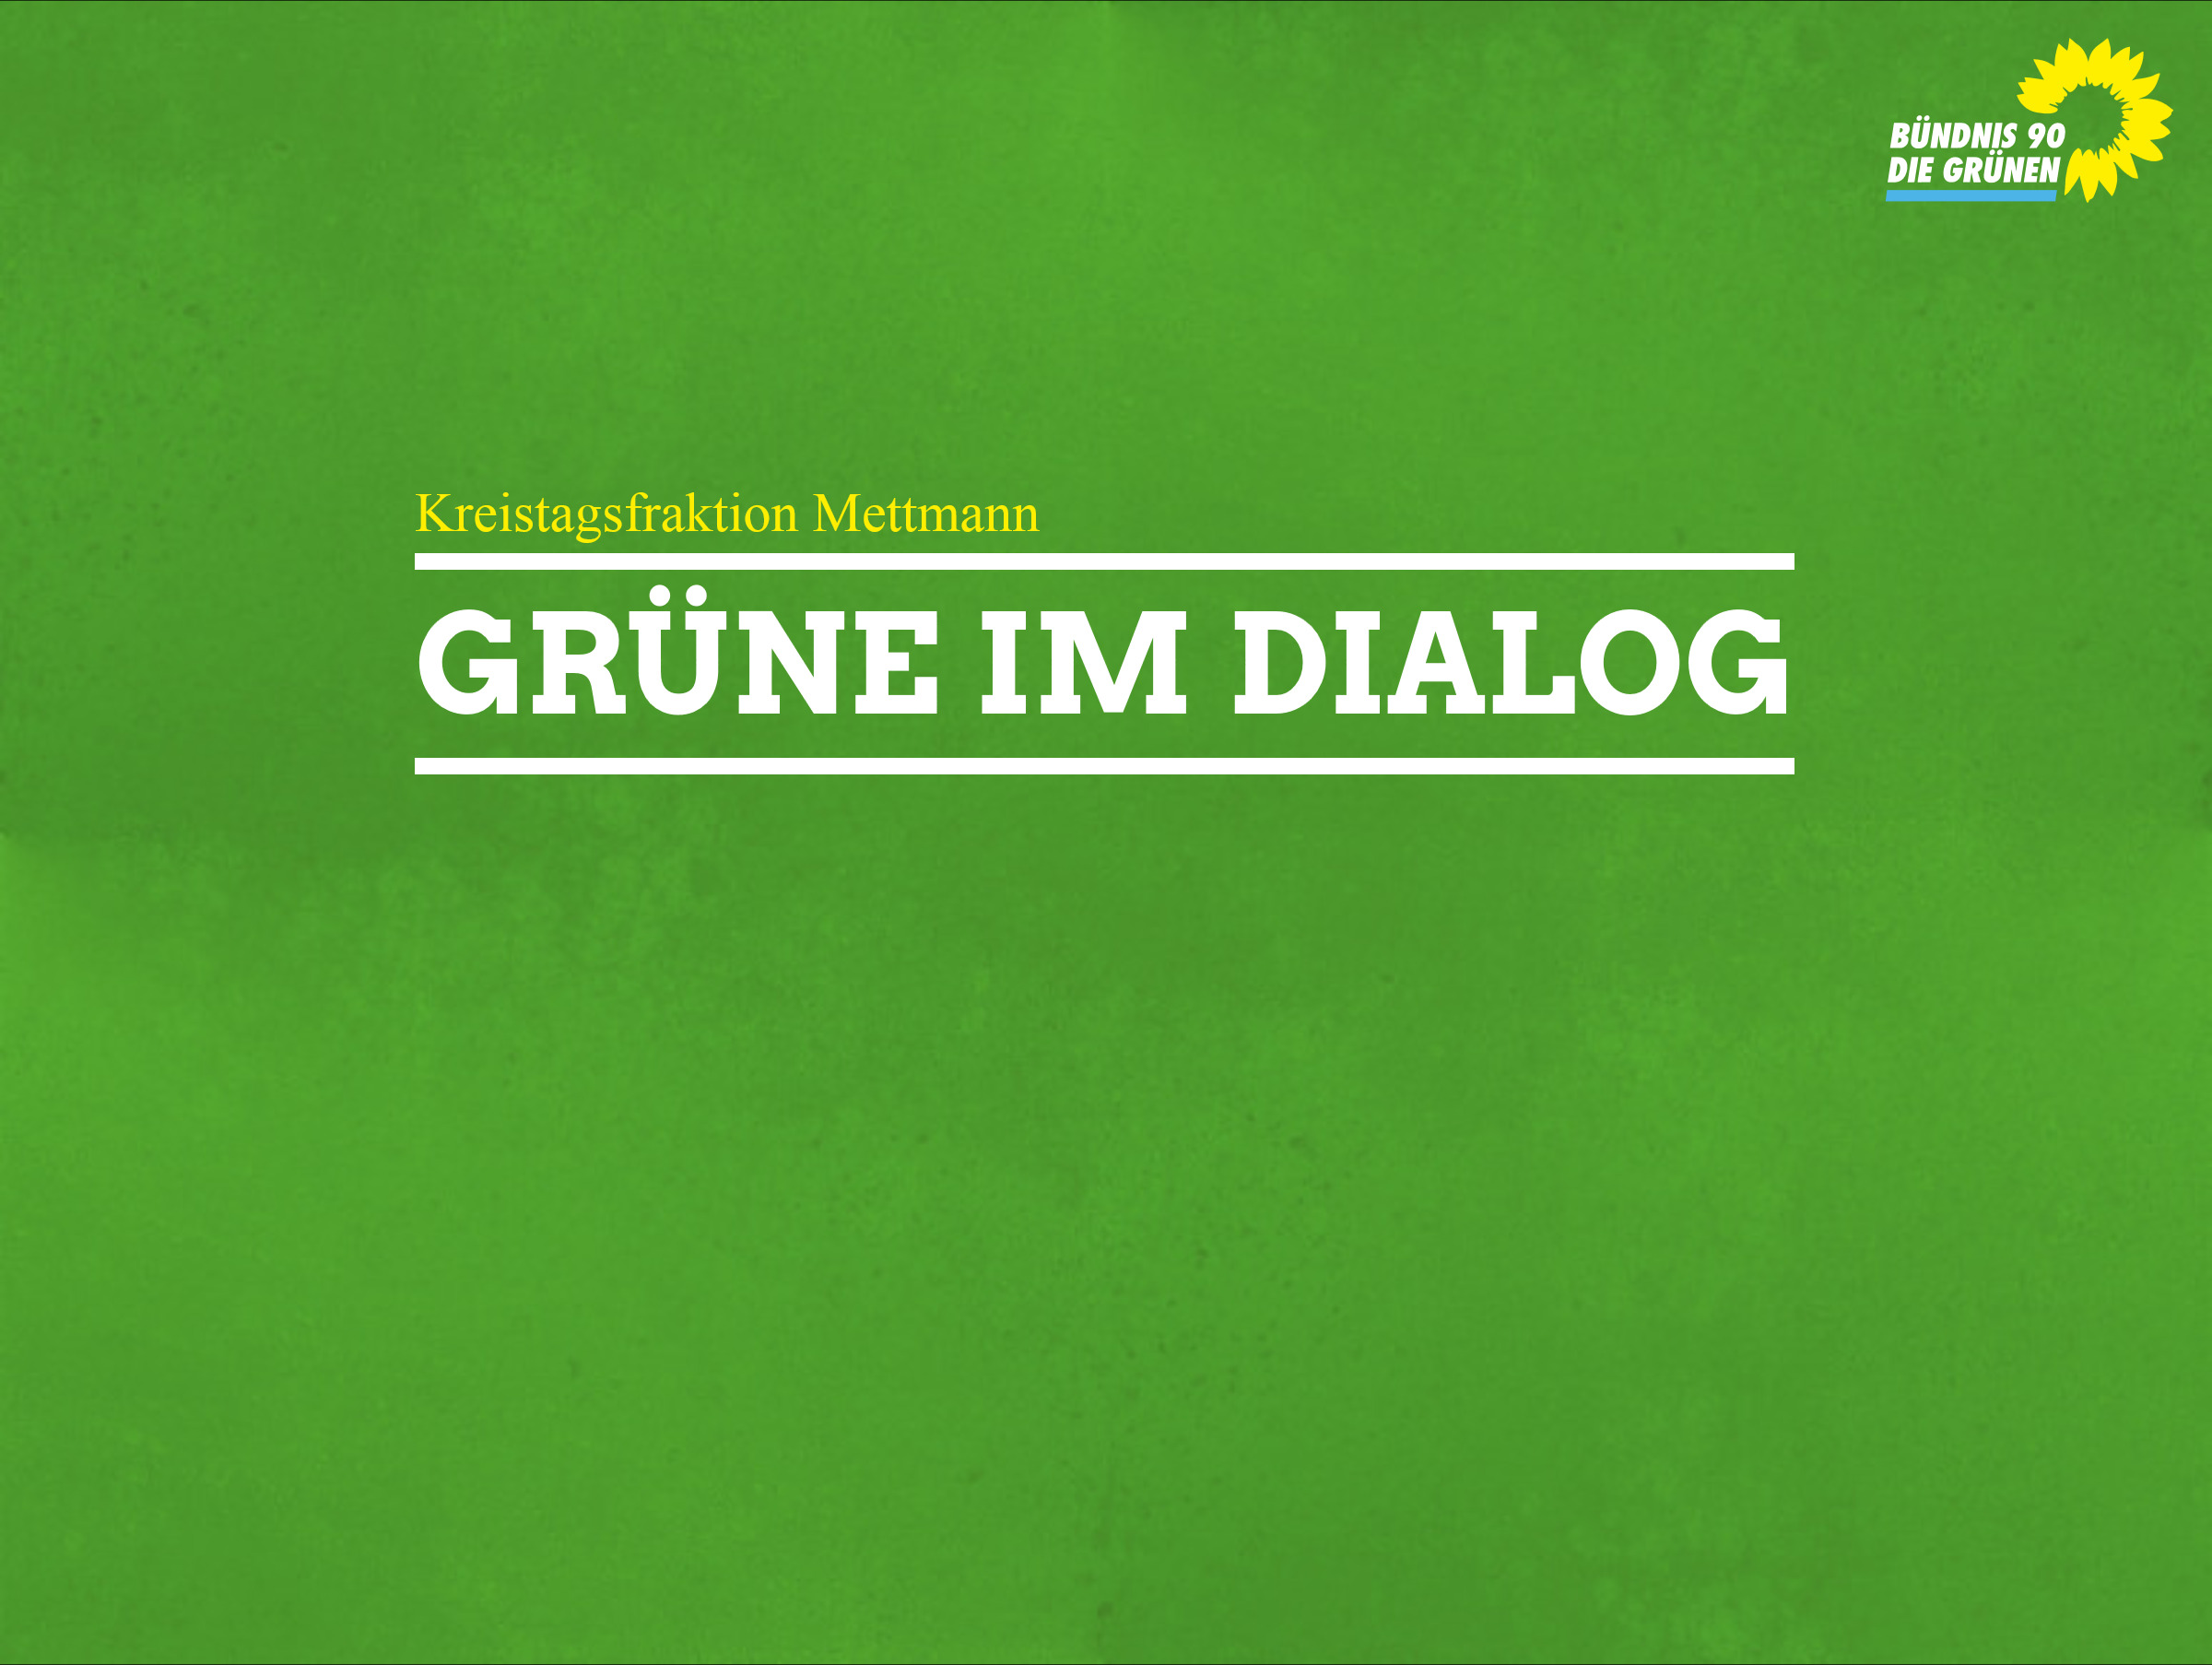 GRÜNE Kreistagsfraktion im Dialog mit UnternehmerKreis ME